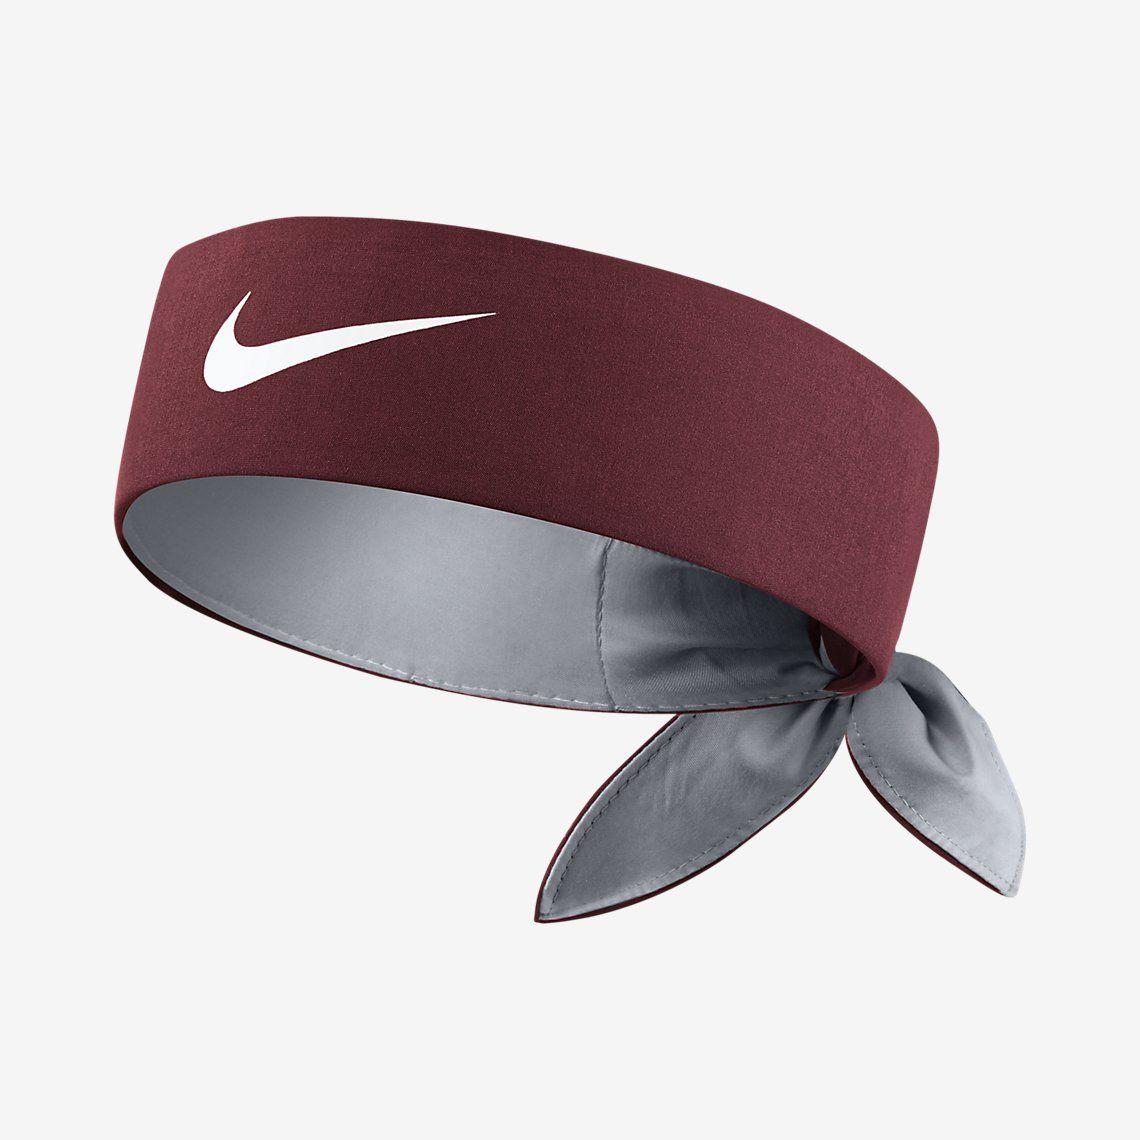 Nike Headband Tennis Headband Nike Store Nike Headbands